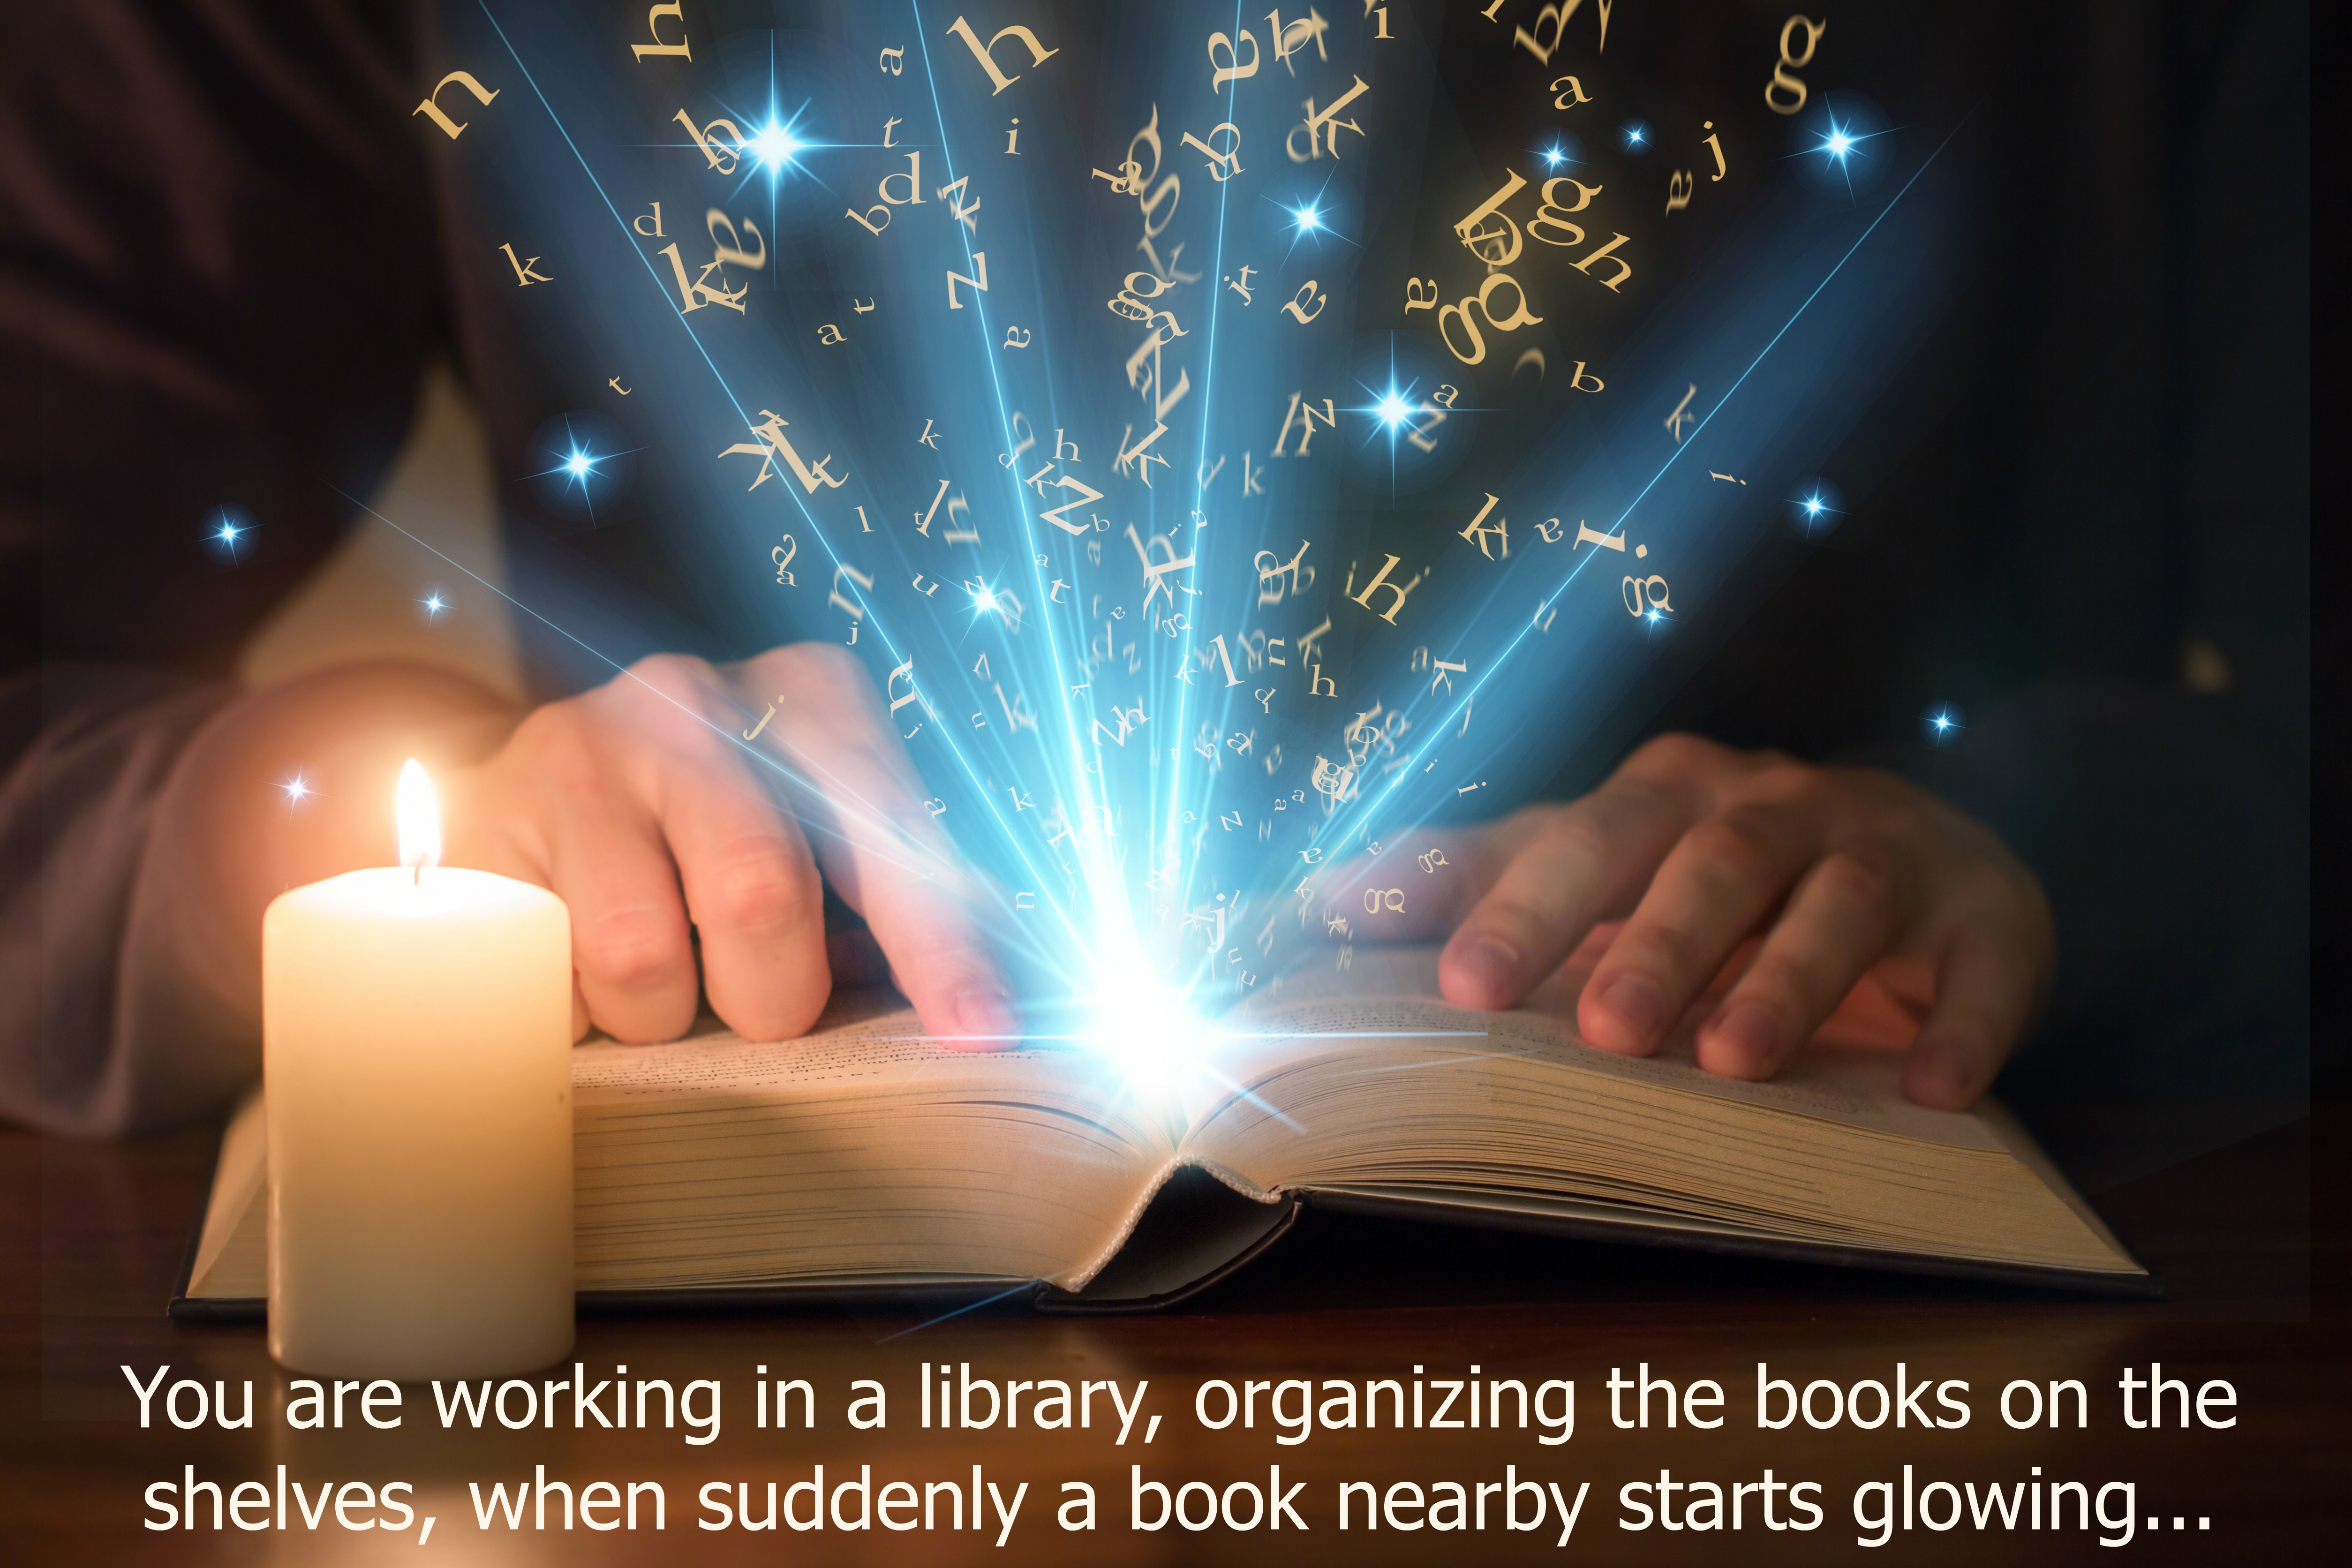 ugc-glowing-book-7